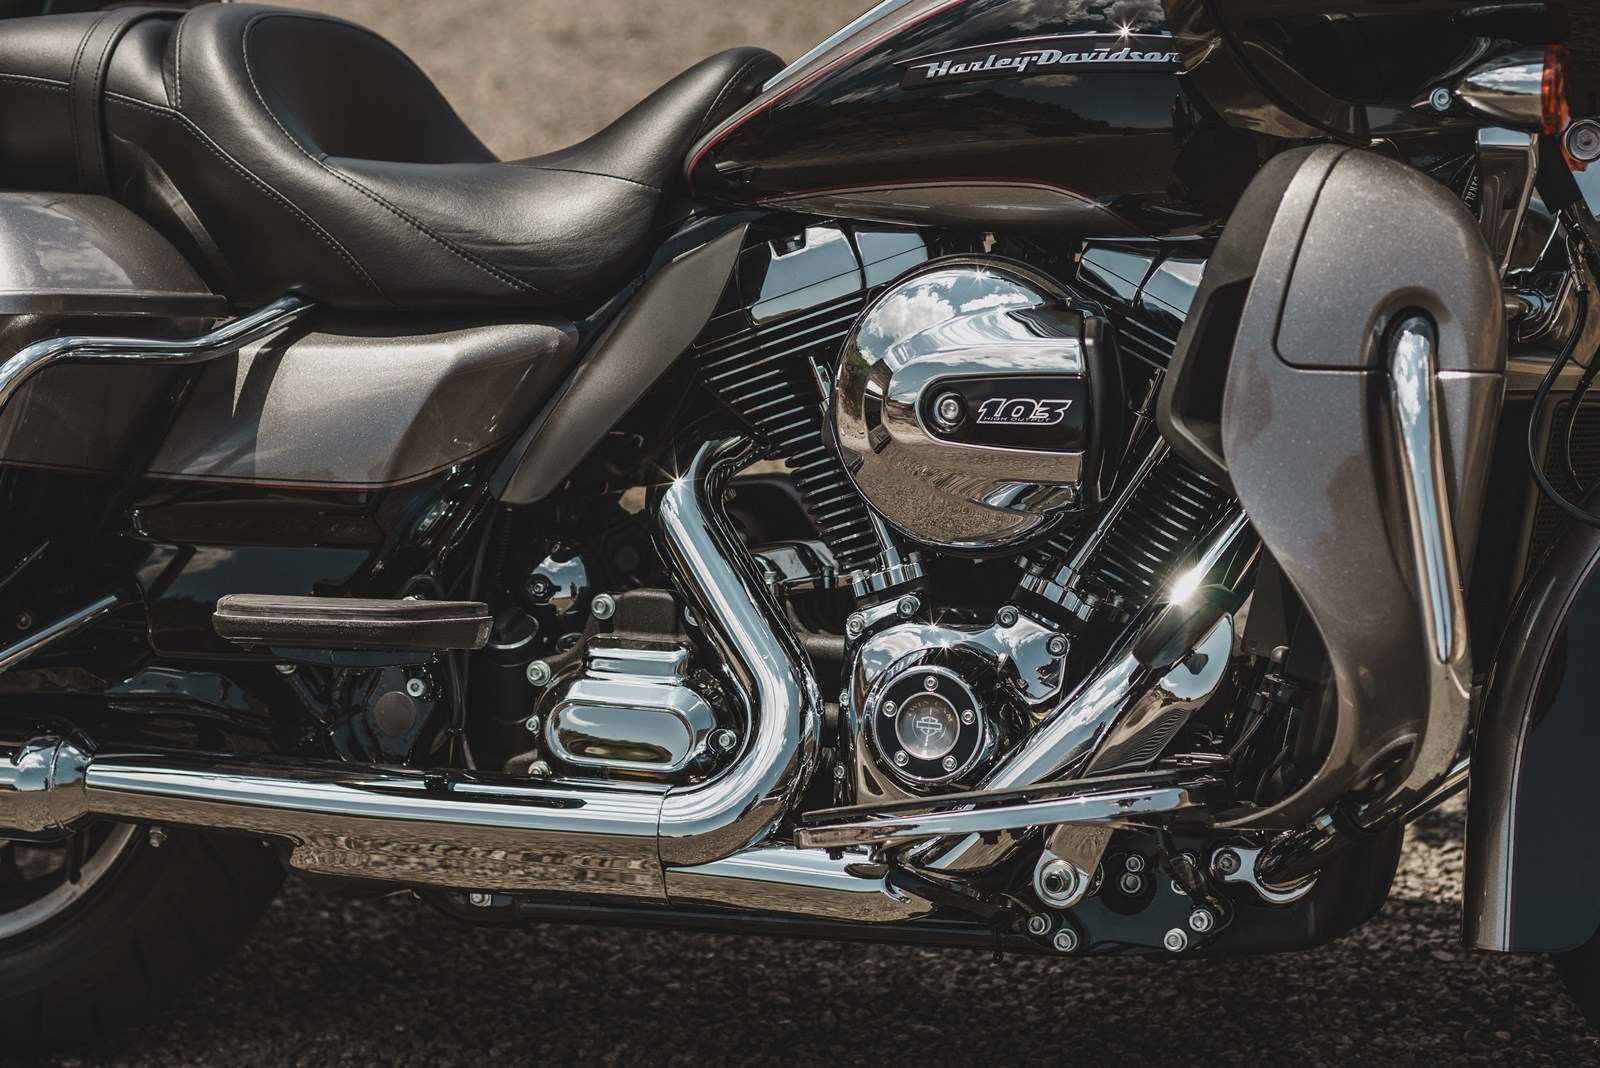 Foto de Gama Harley-Davidson 2016 (9/24)